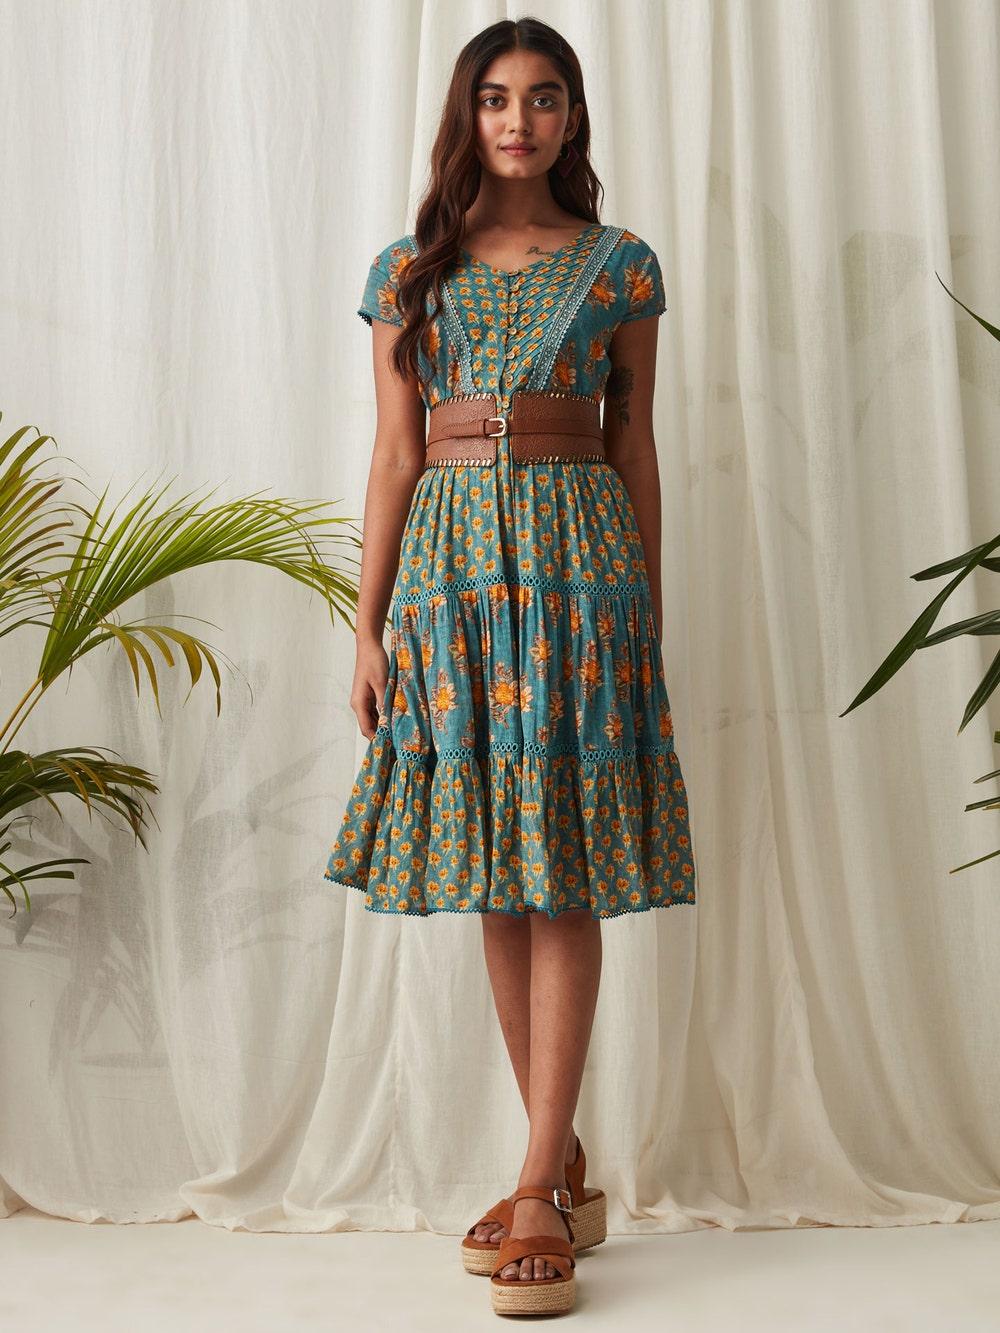 Teal Printed Short Dress